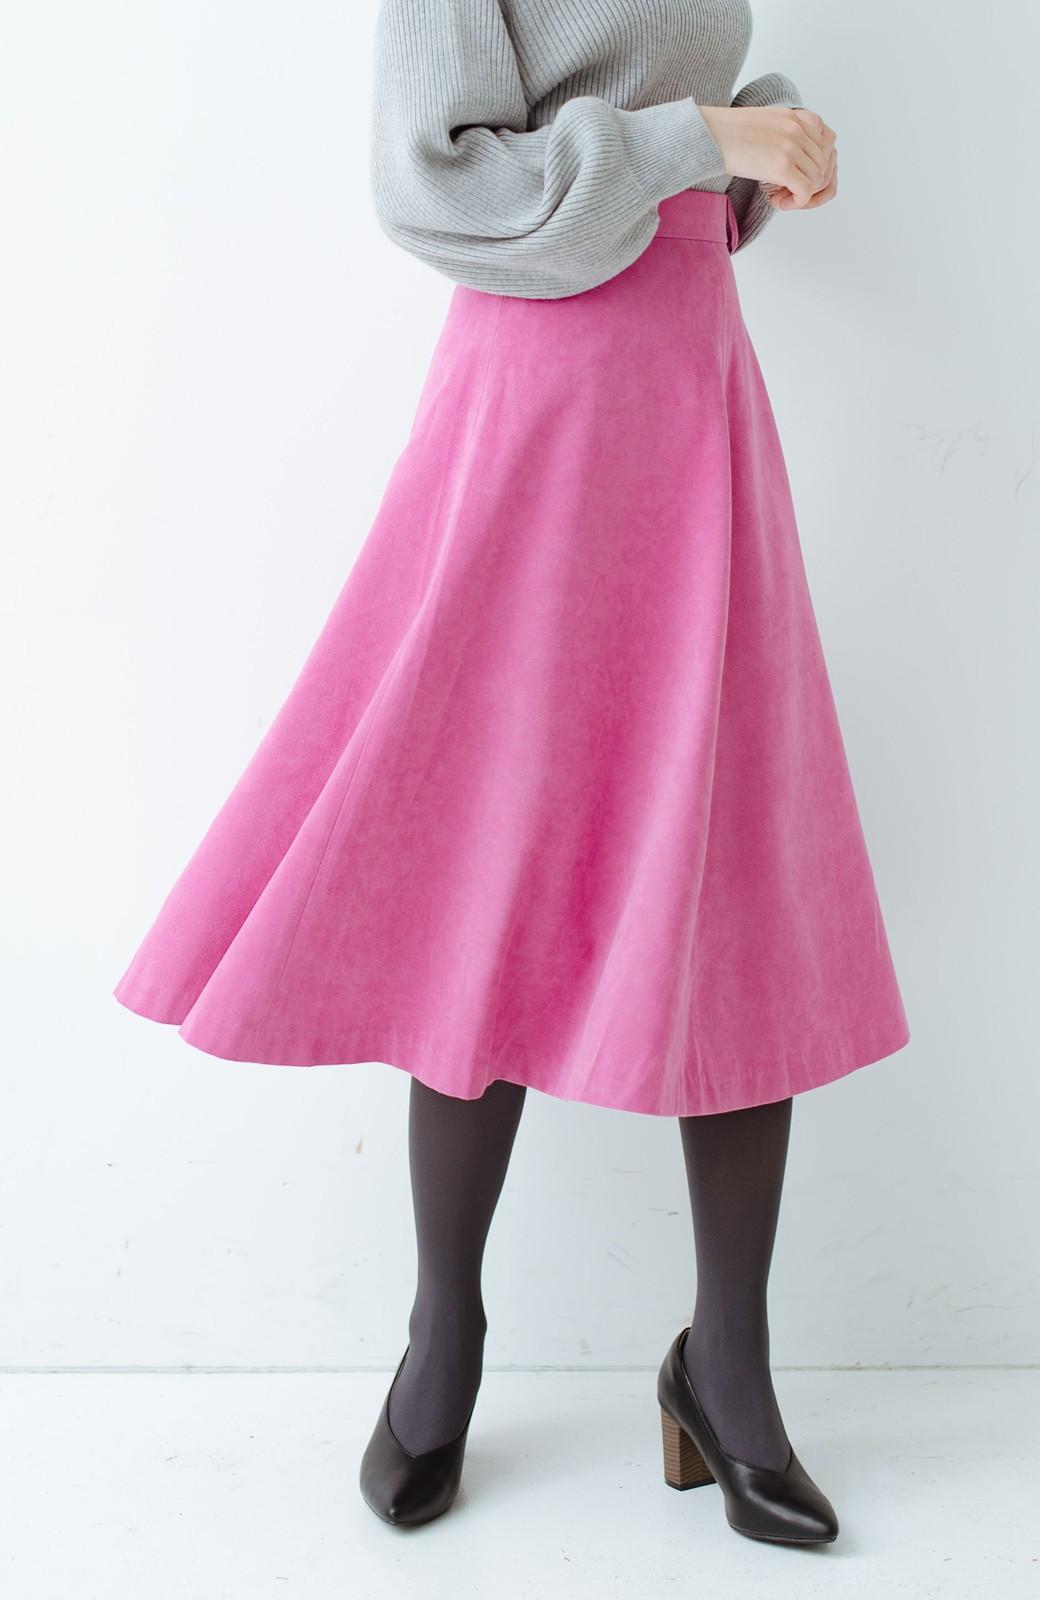 haco! 女っぽく上品に見える フレアースカート by que made me <ピンク>の商品写真2